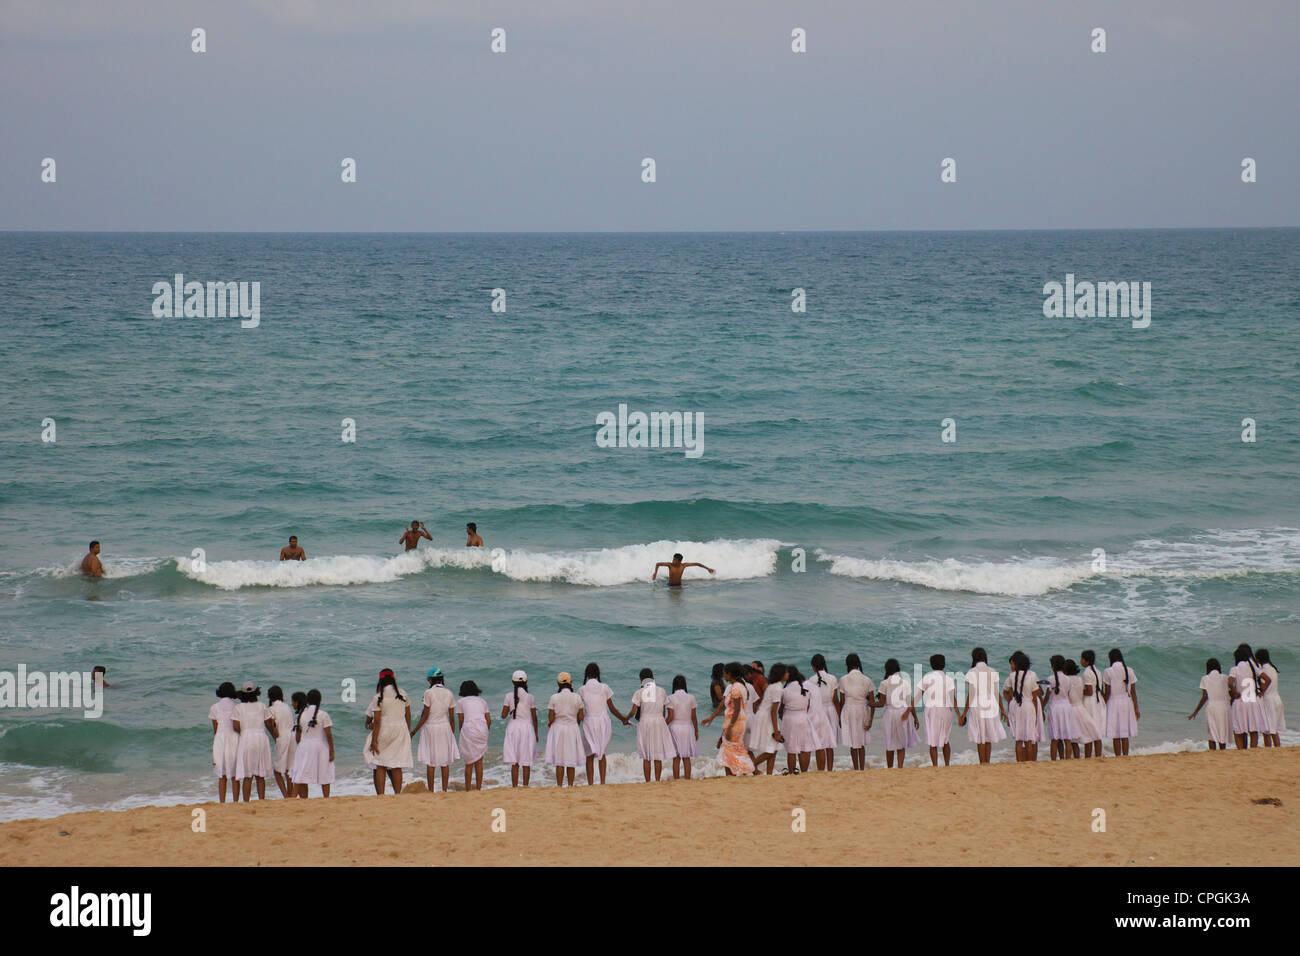 Schoolgirls on the beach, Nilaveli, Trincomalee, Sri Lanka, Asia - Stock Image